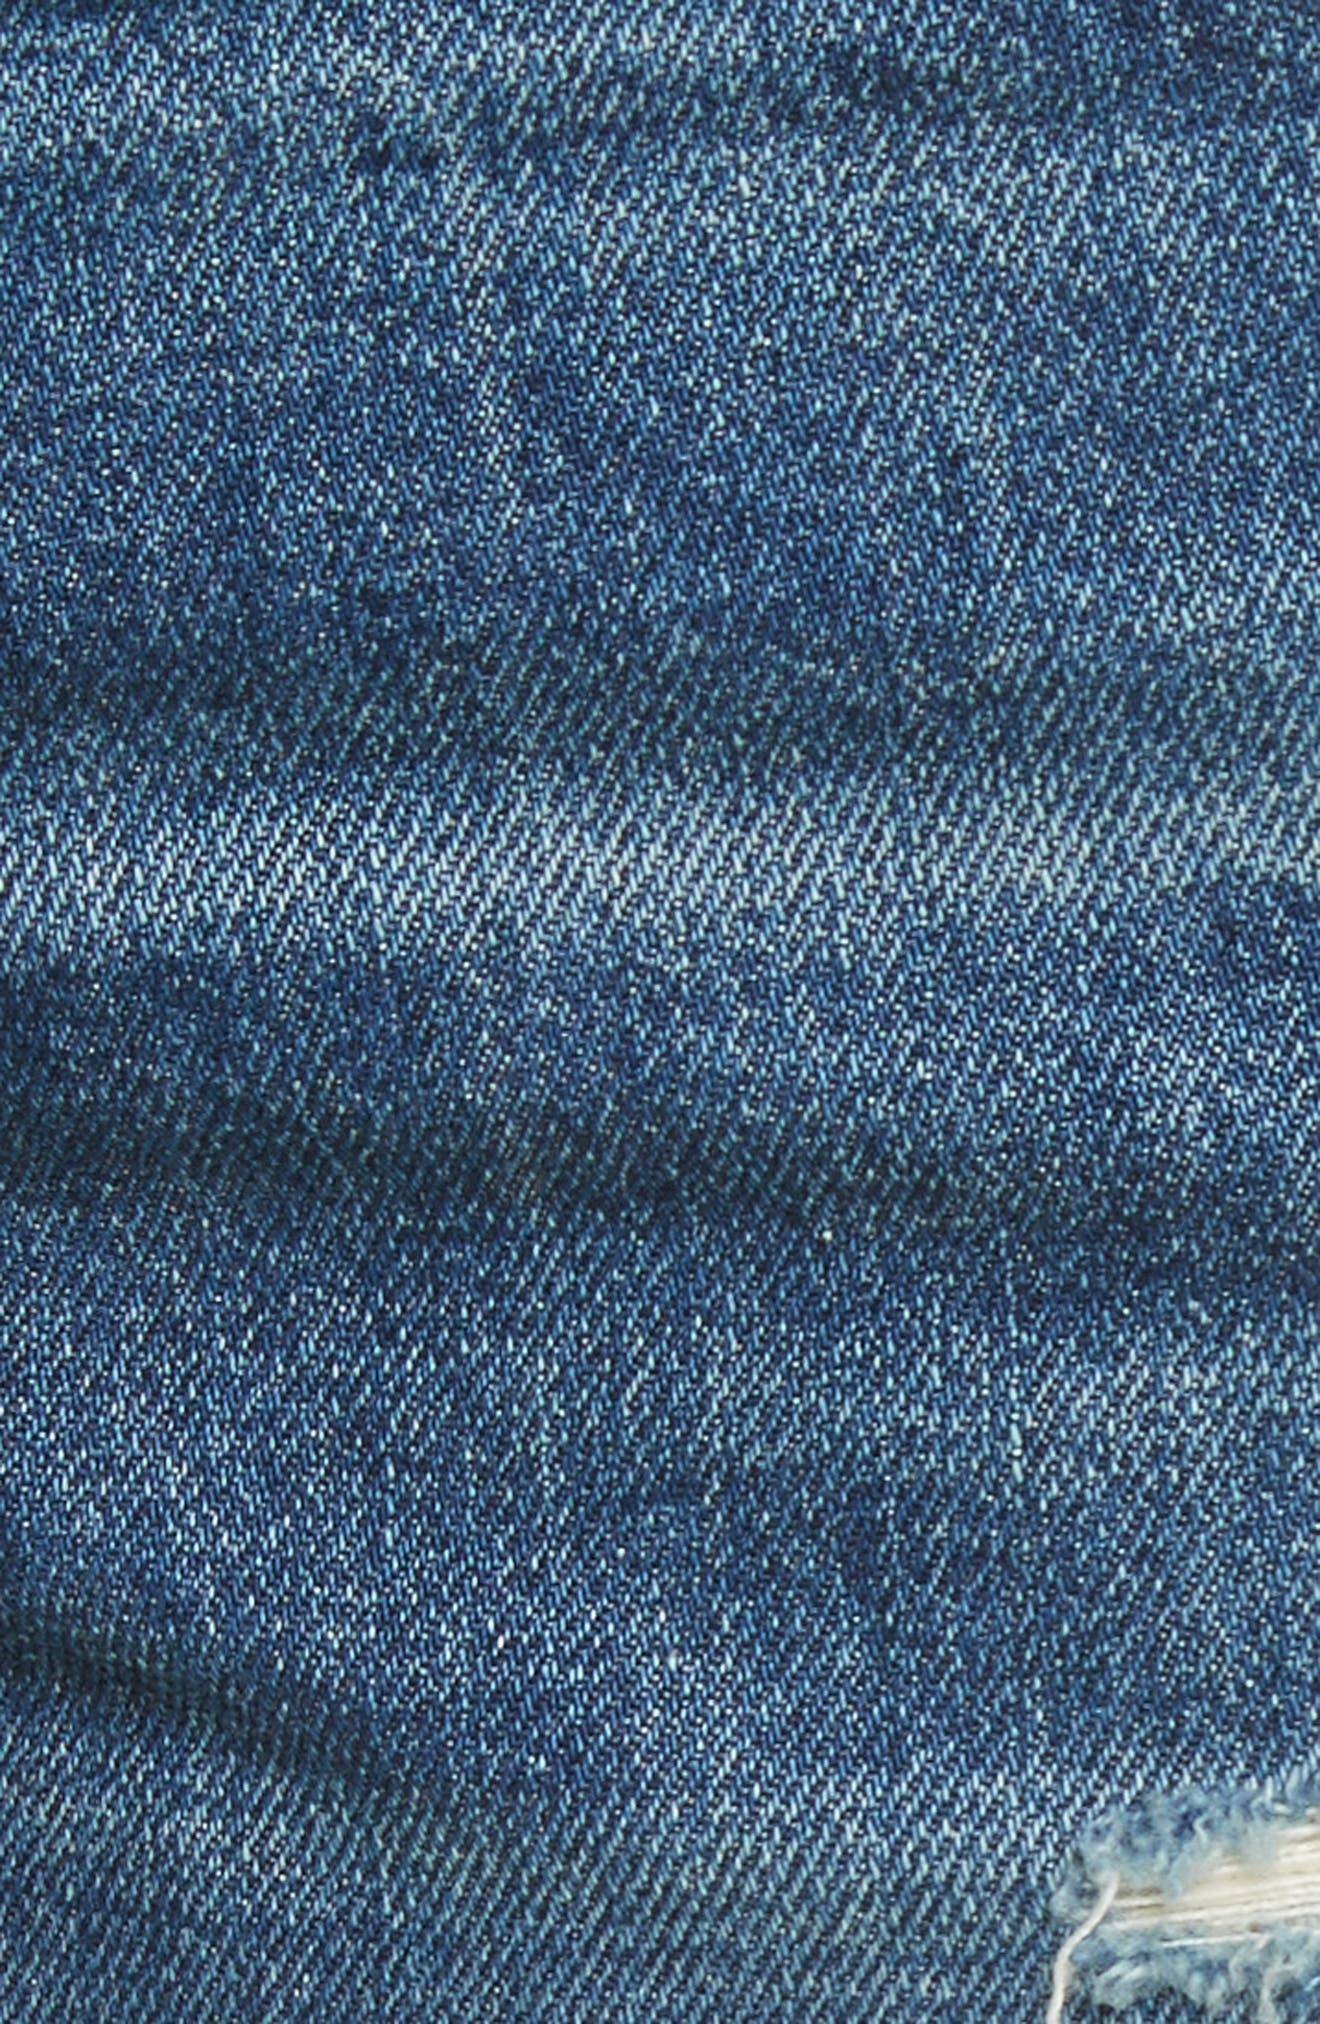 Cutoff Denim Shorts,                             Alternate thumbnail 6, color,                             Johnny